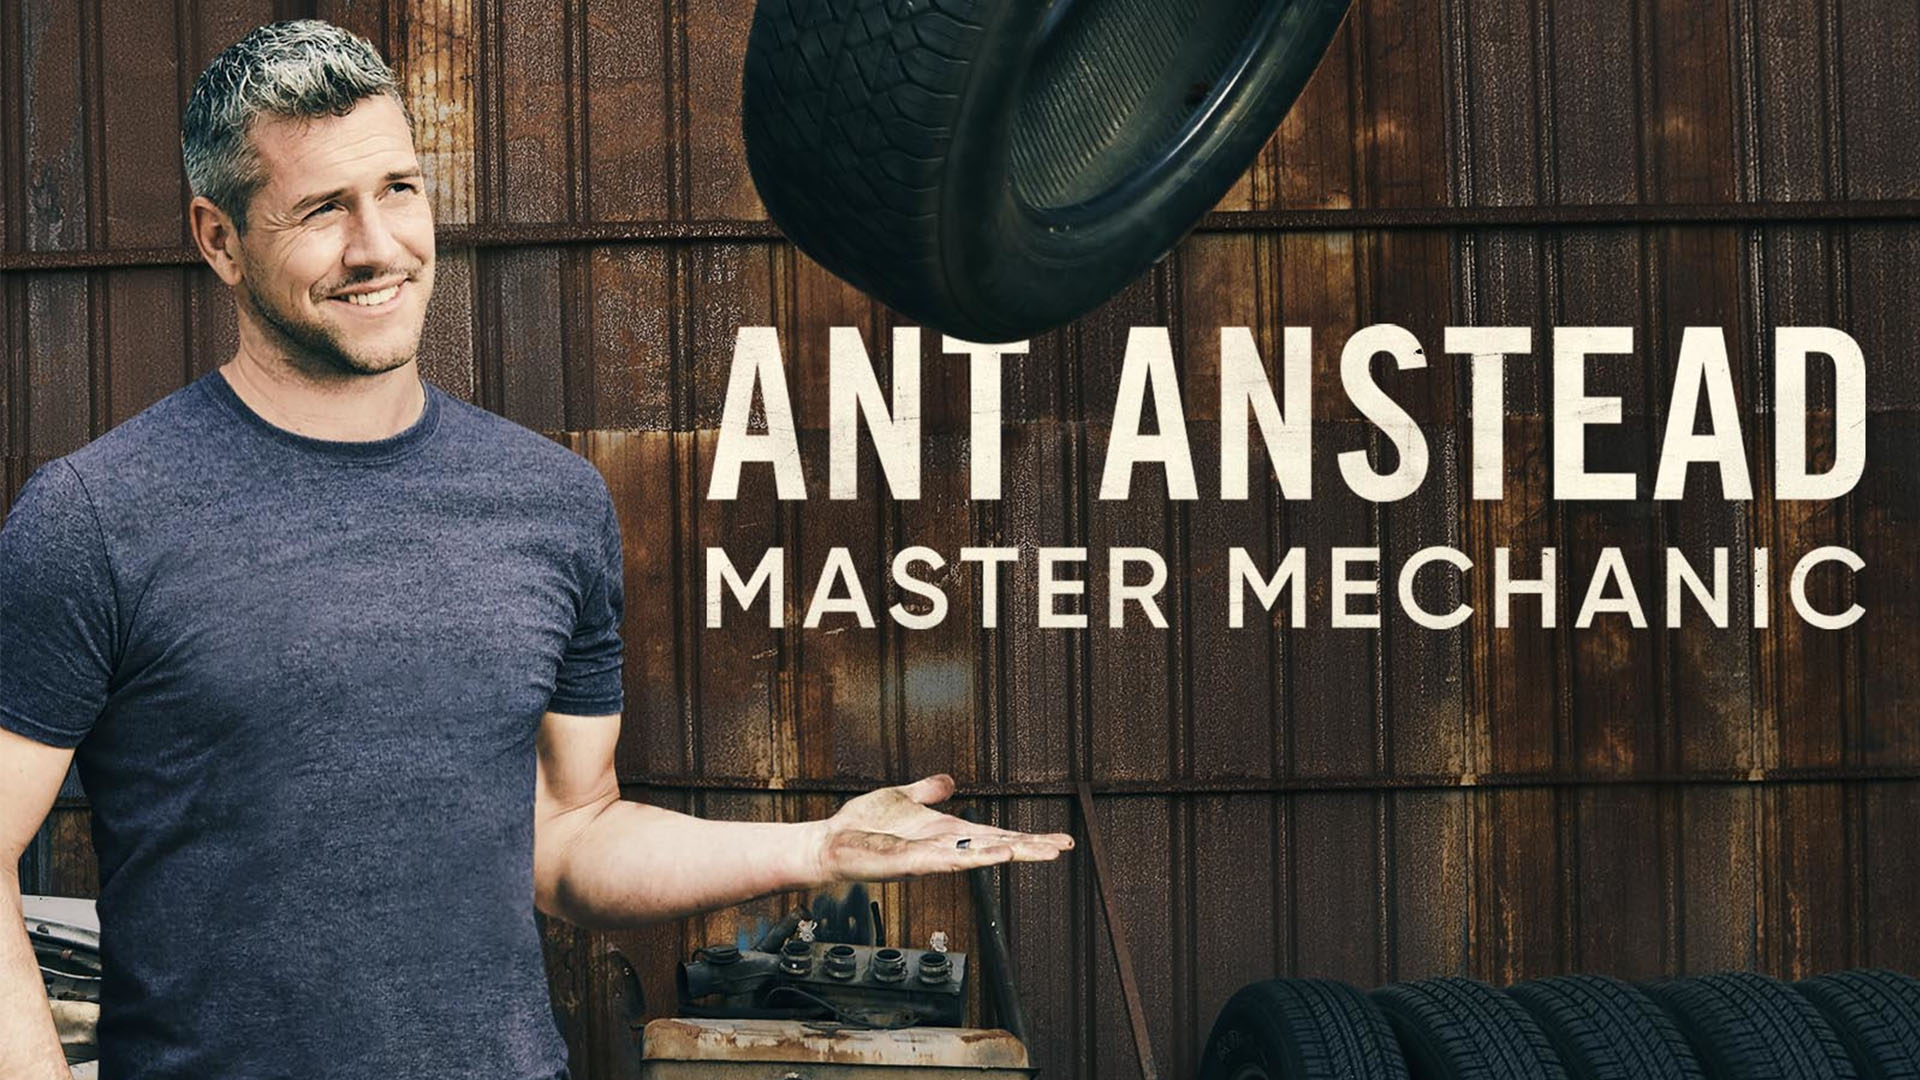 Ant Anstead Master Mechanic - Season 1